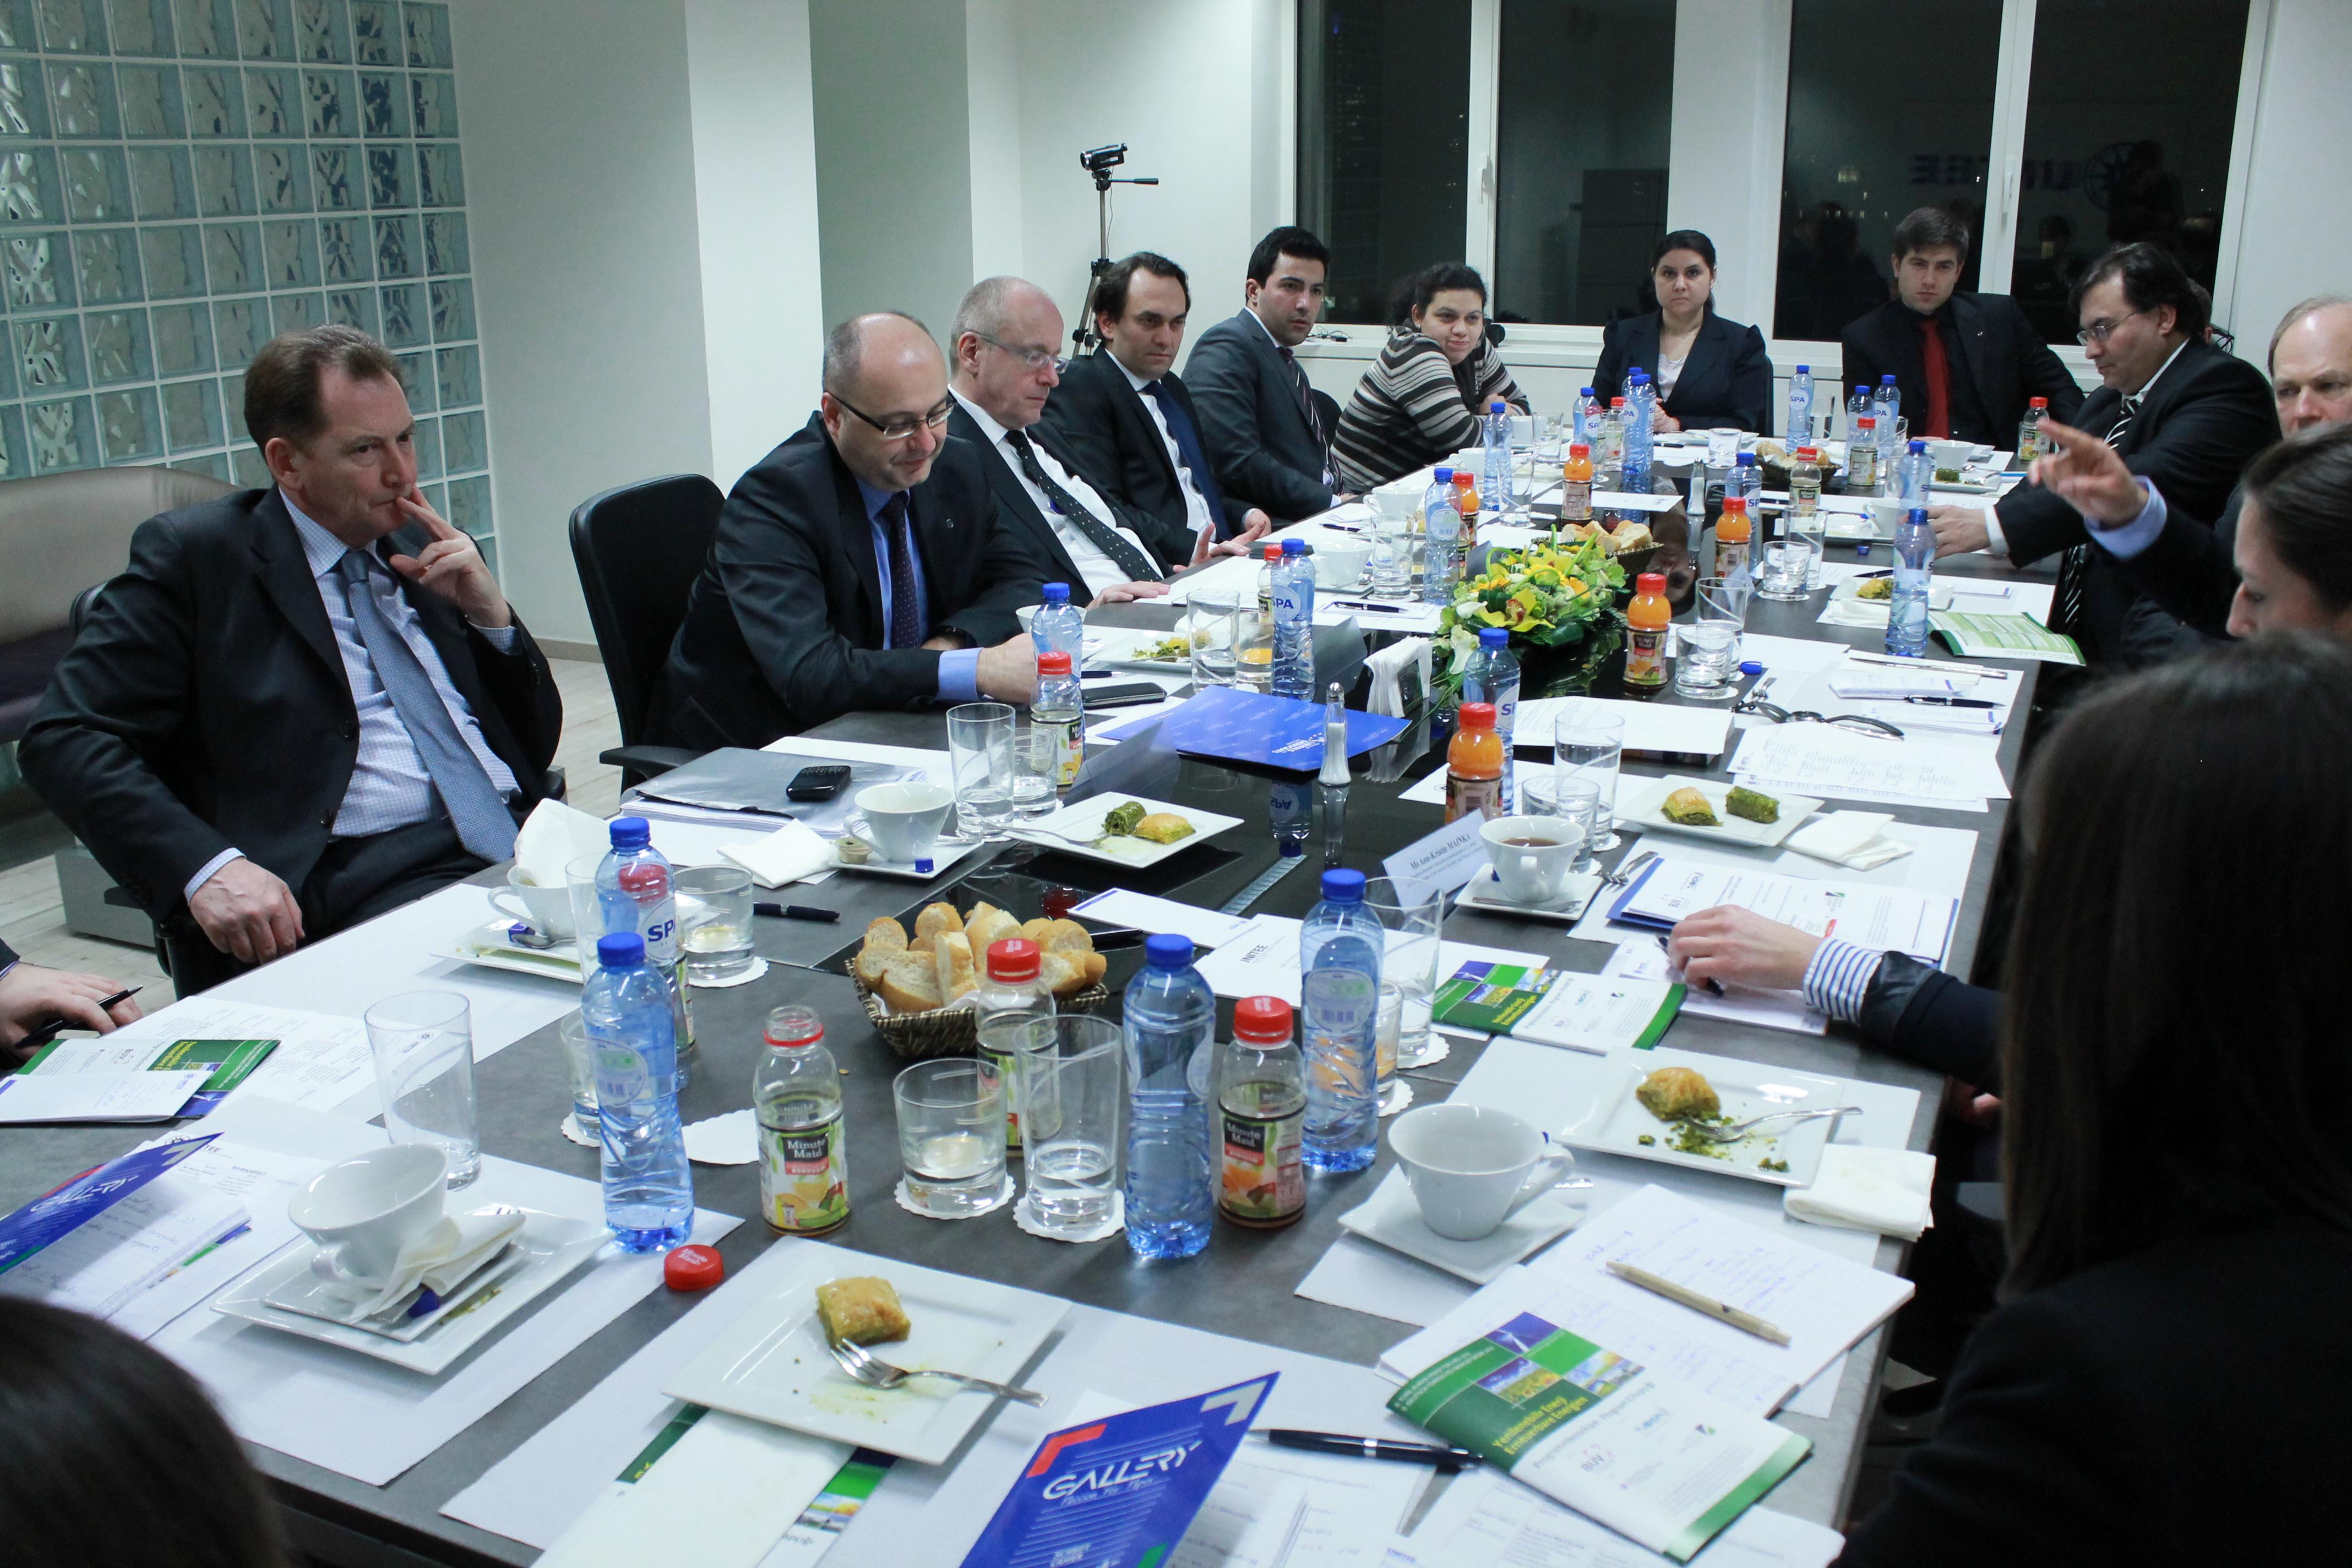 2013-03-20_Expert Roundtable_EU-Turkey Relations (2)